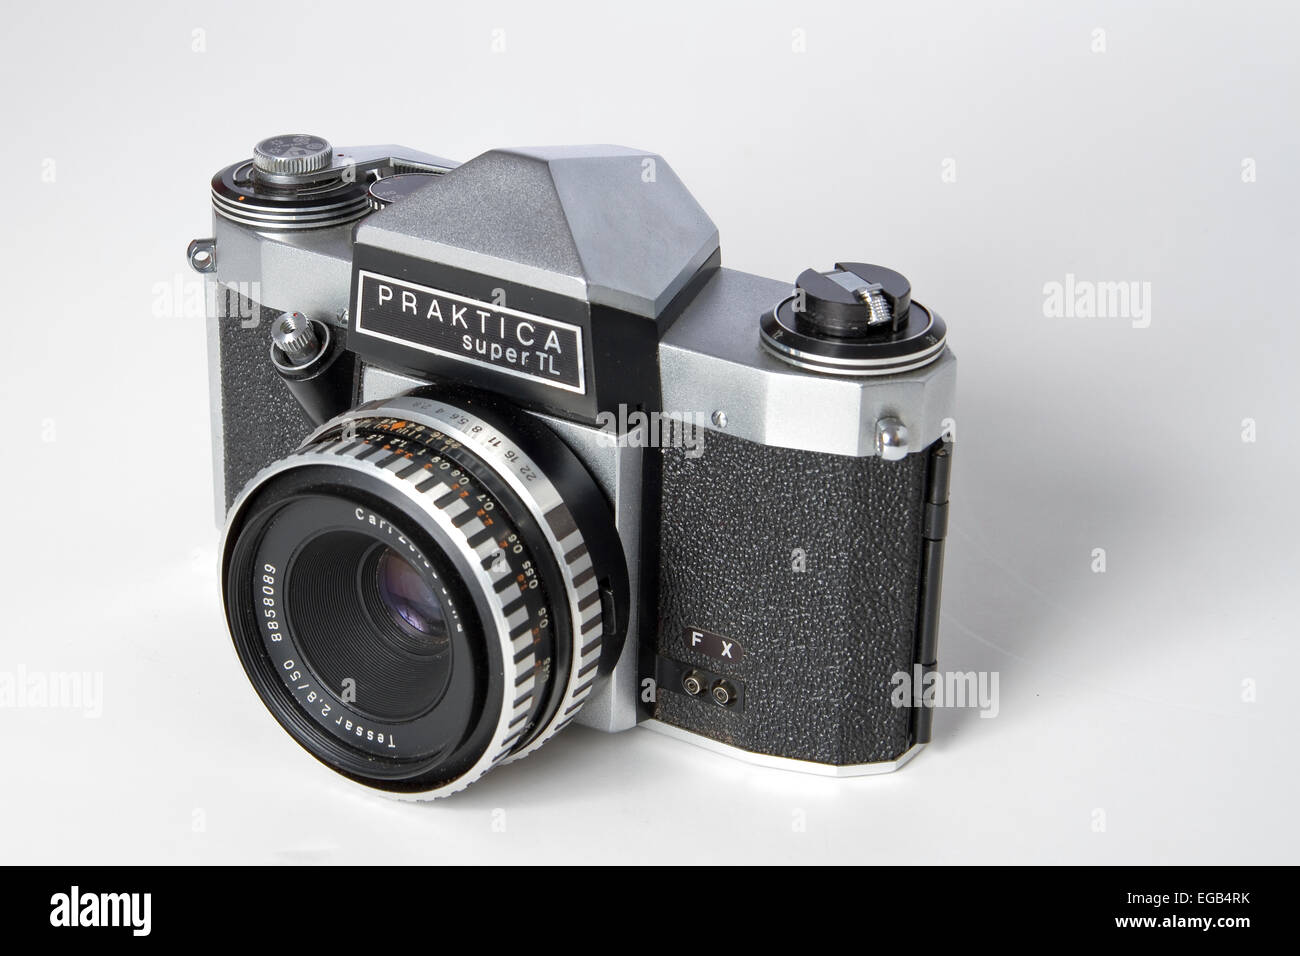 Praktica Super TL 35mm SLR Camera Vintage Camera - Stock Image